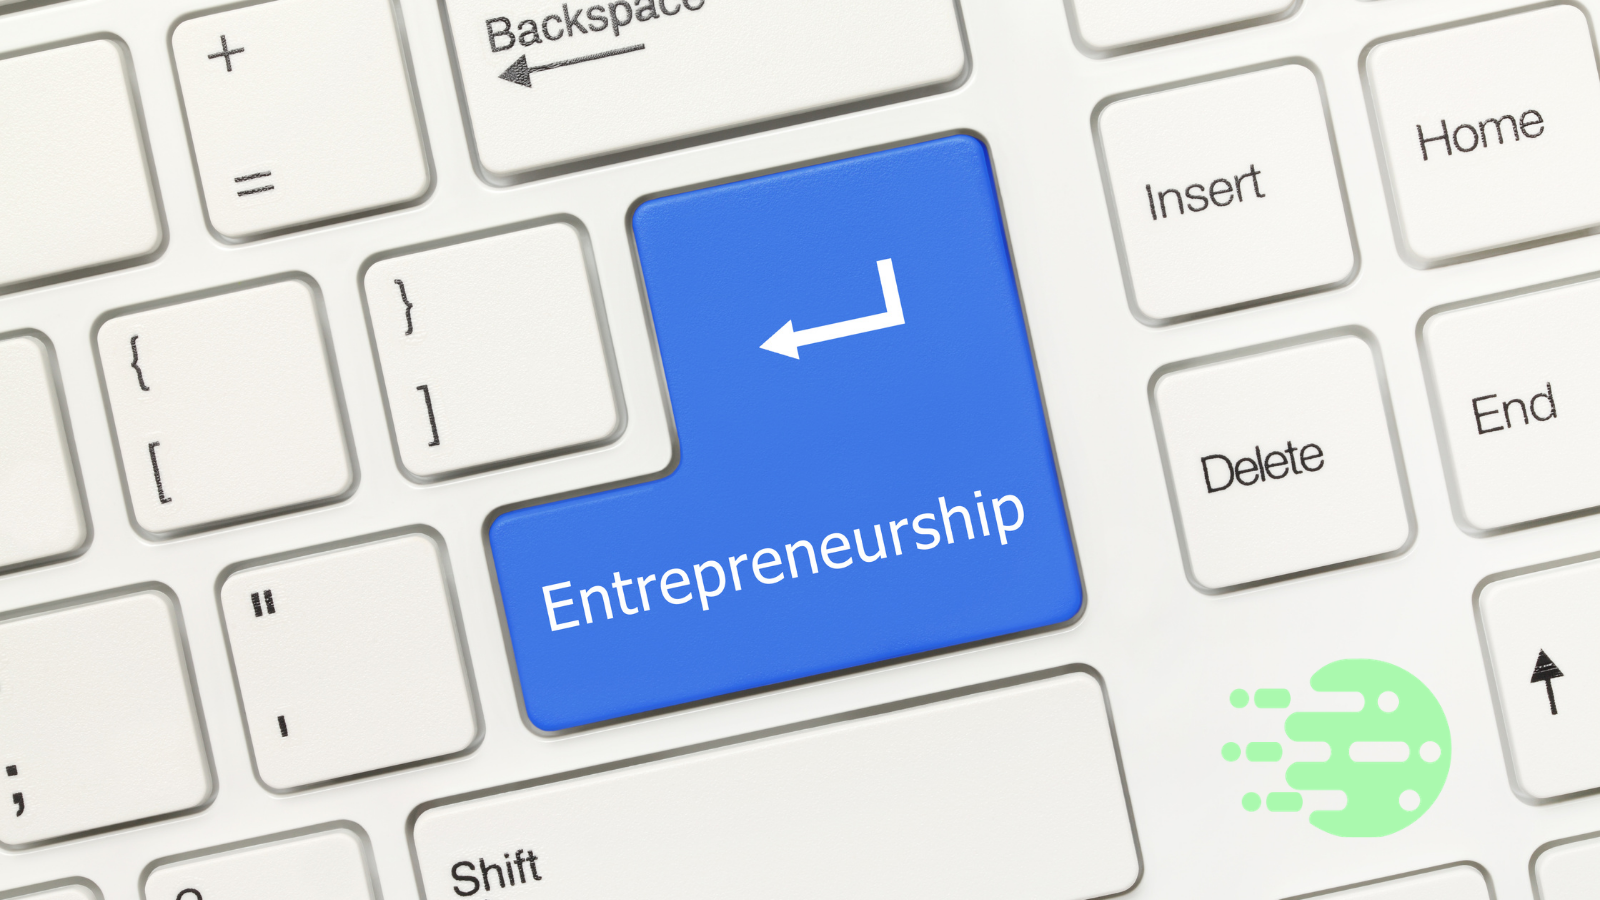 Types of entepreneurs